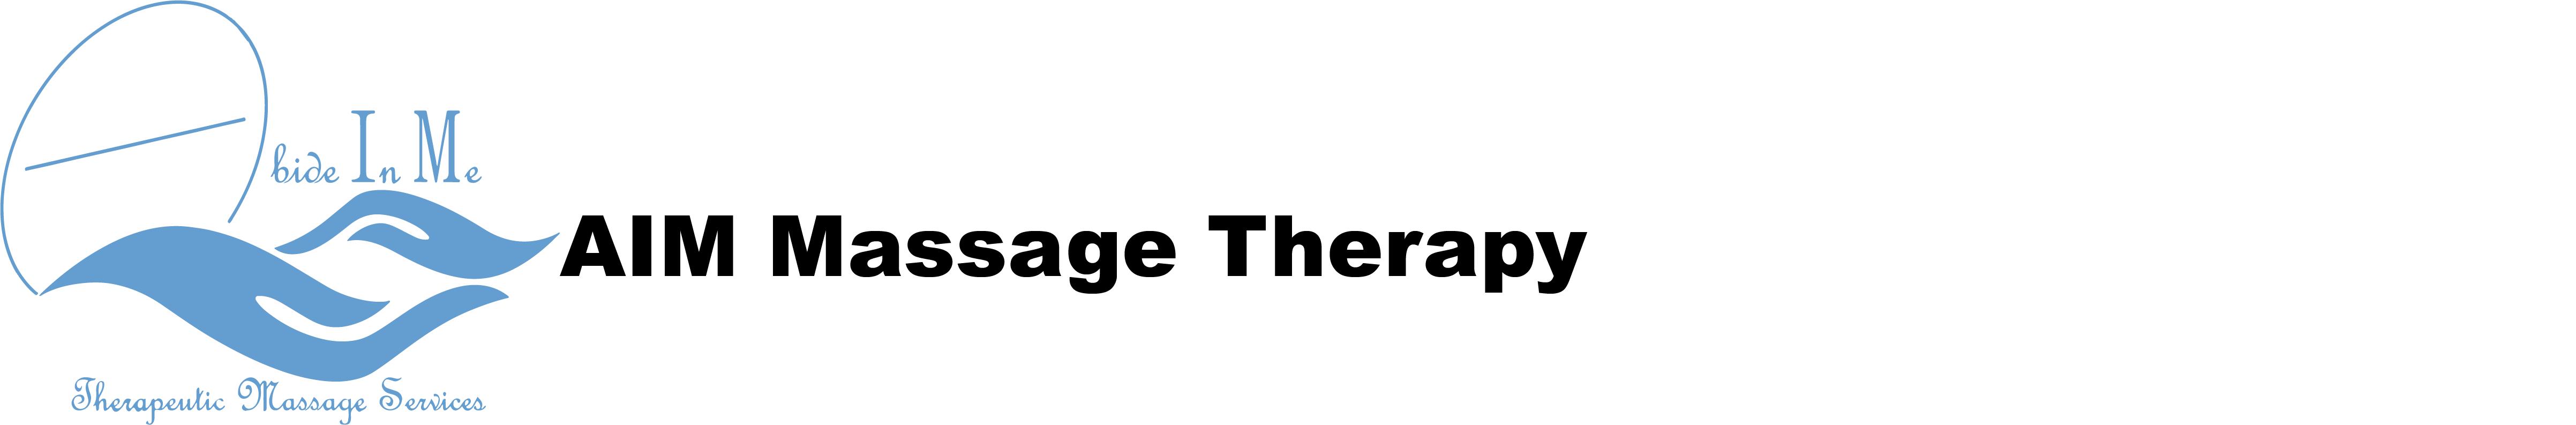 AIM Massage Therapy